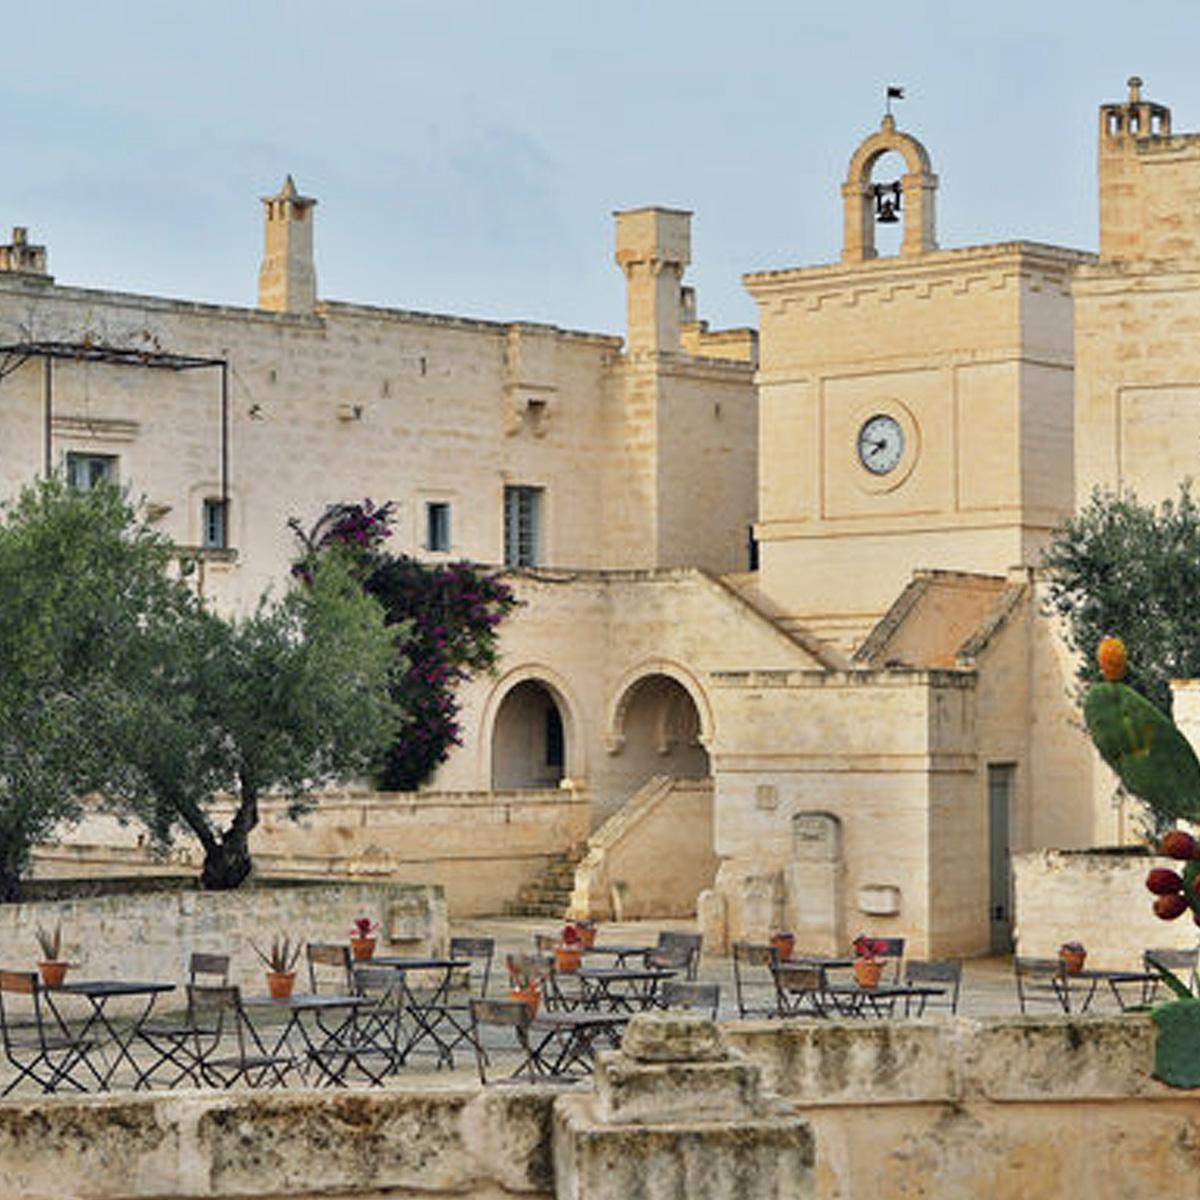 Borgo Egnazia (6)